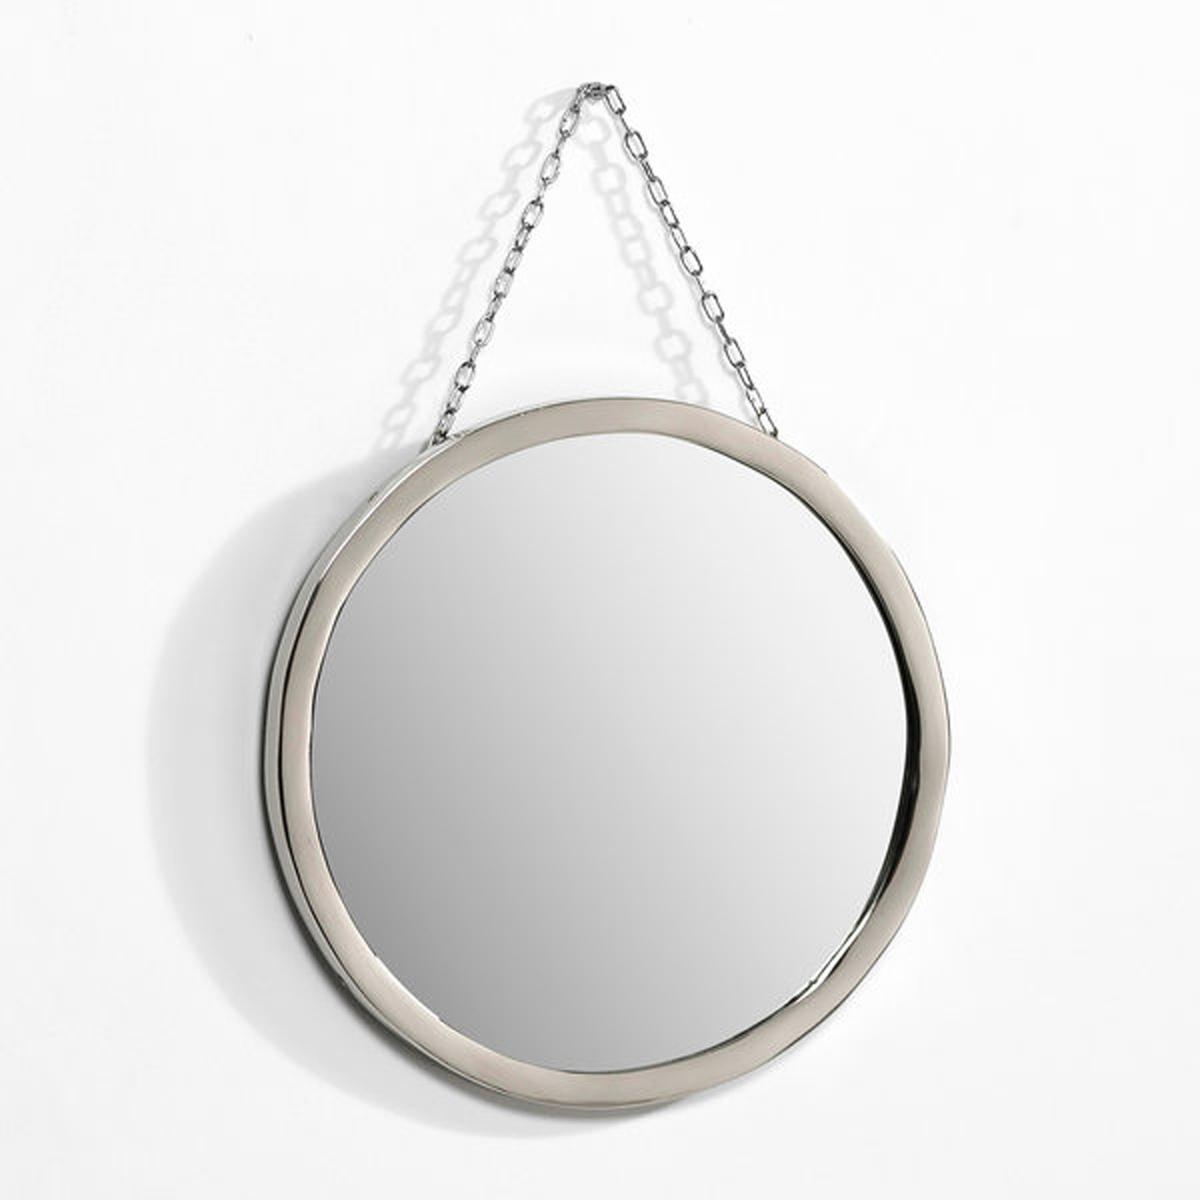 Зеркало Barbier, круглое Ø30 см